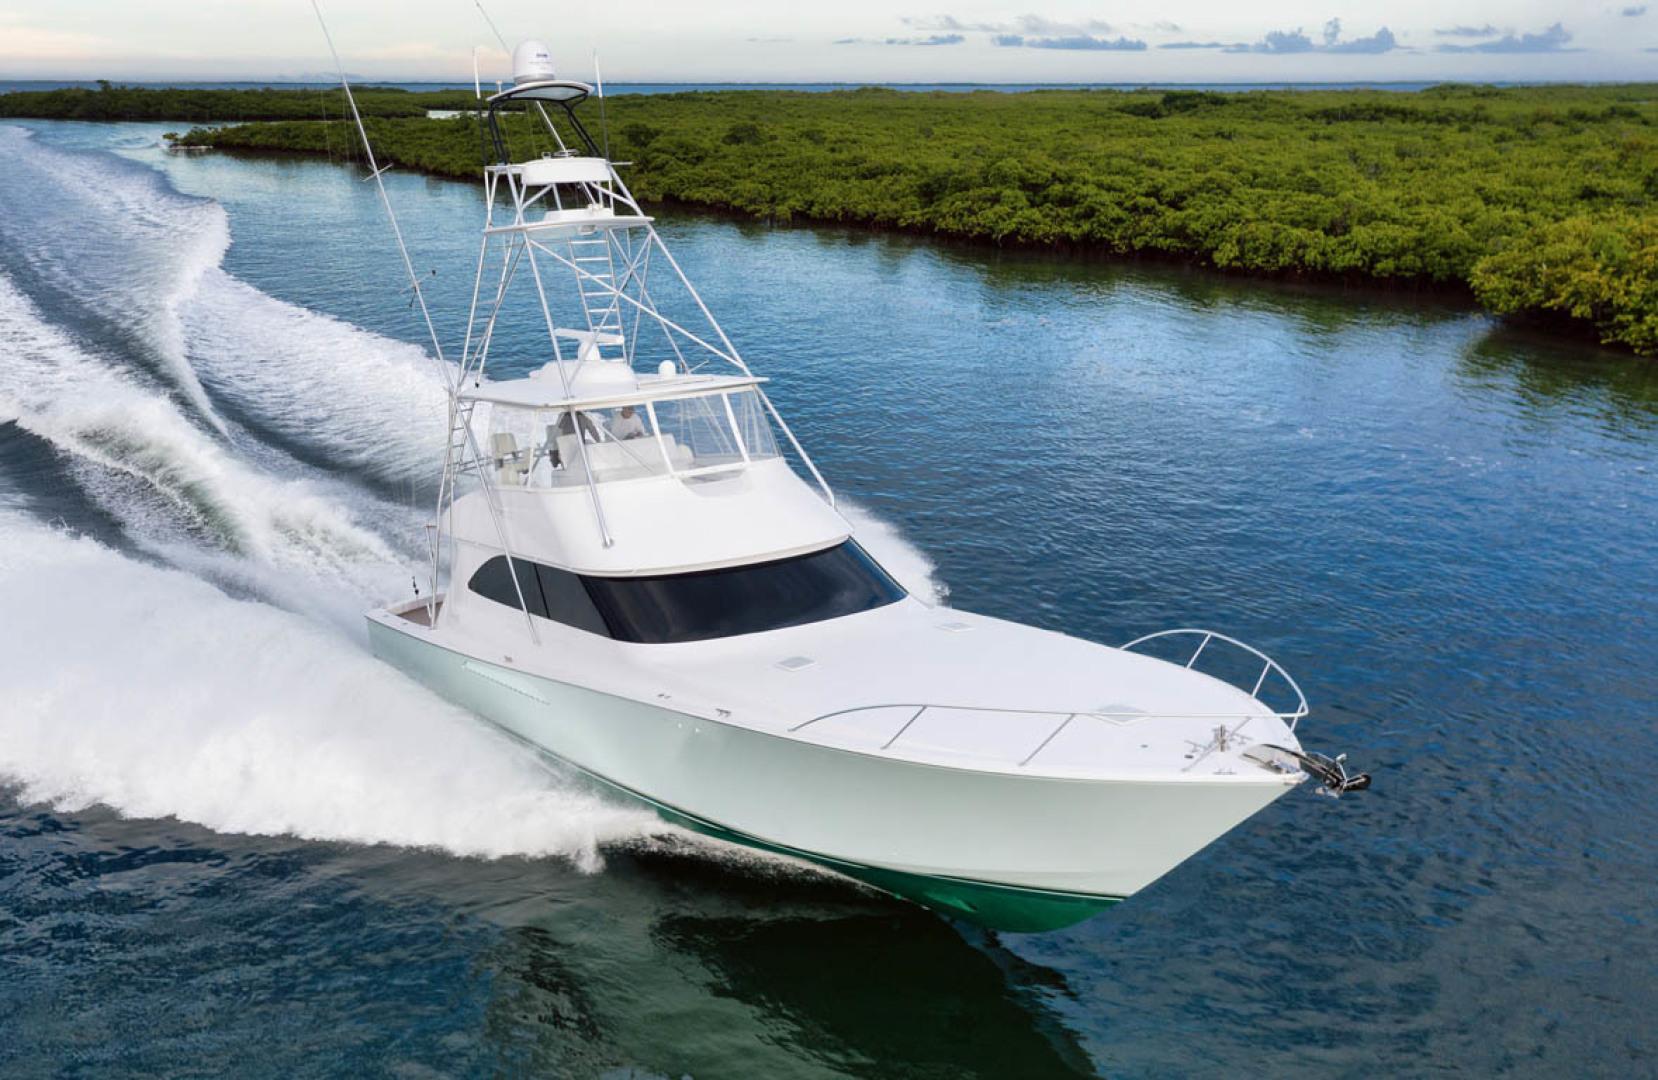 Viking-Convertible 2009-MOLLIE K Key Largo-Florida-United States-Starboard Bow View-1487407 | Thumbnail